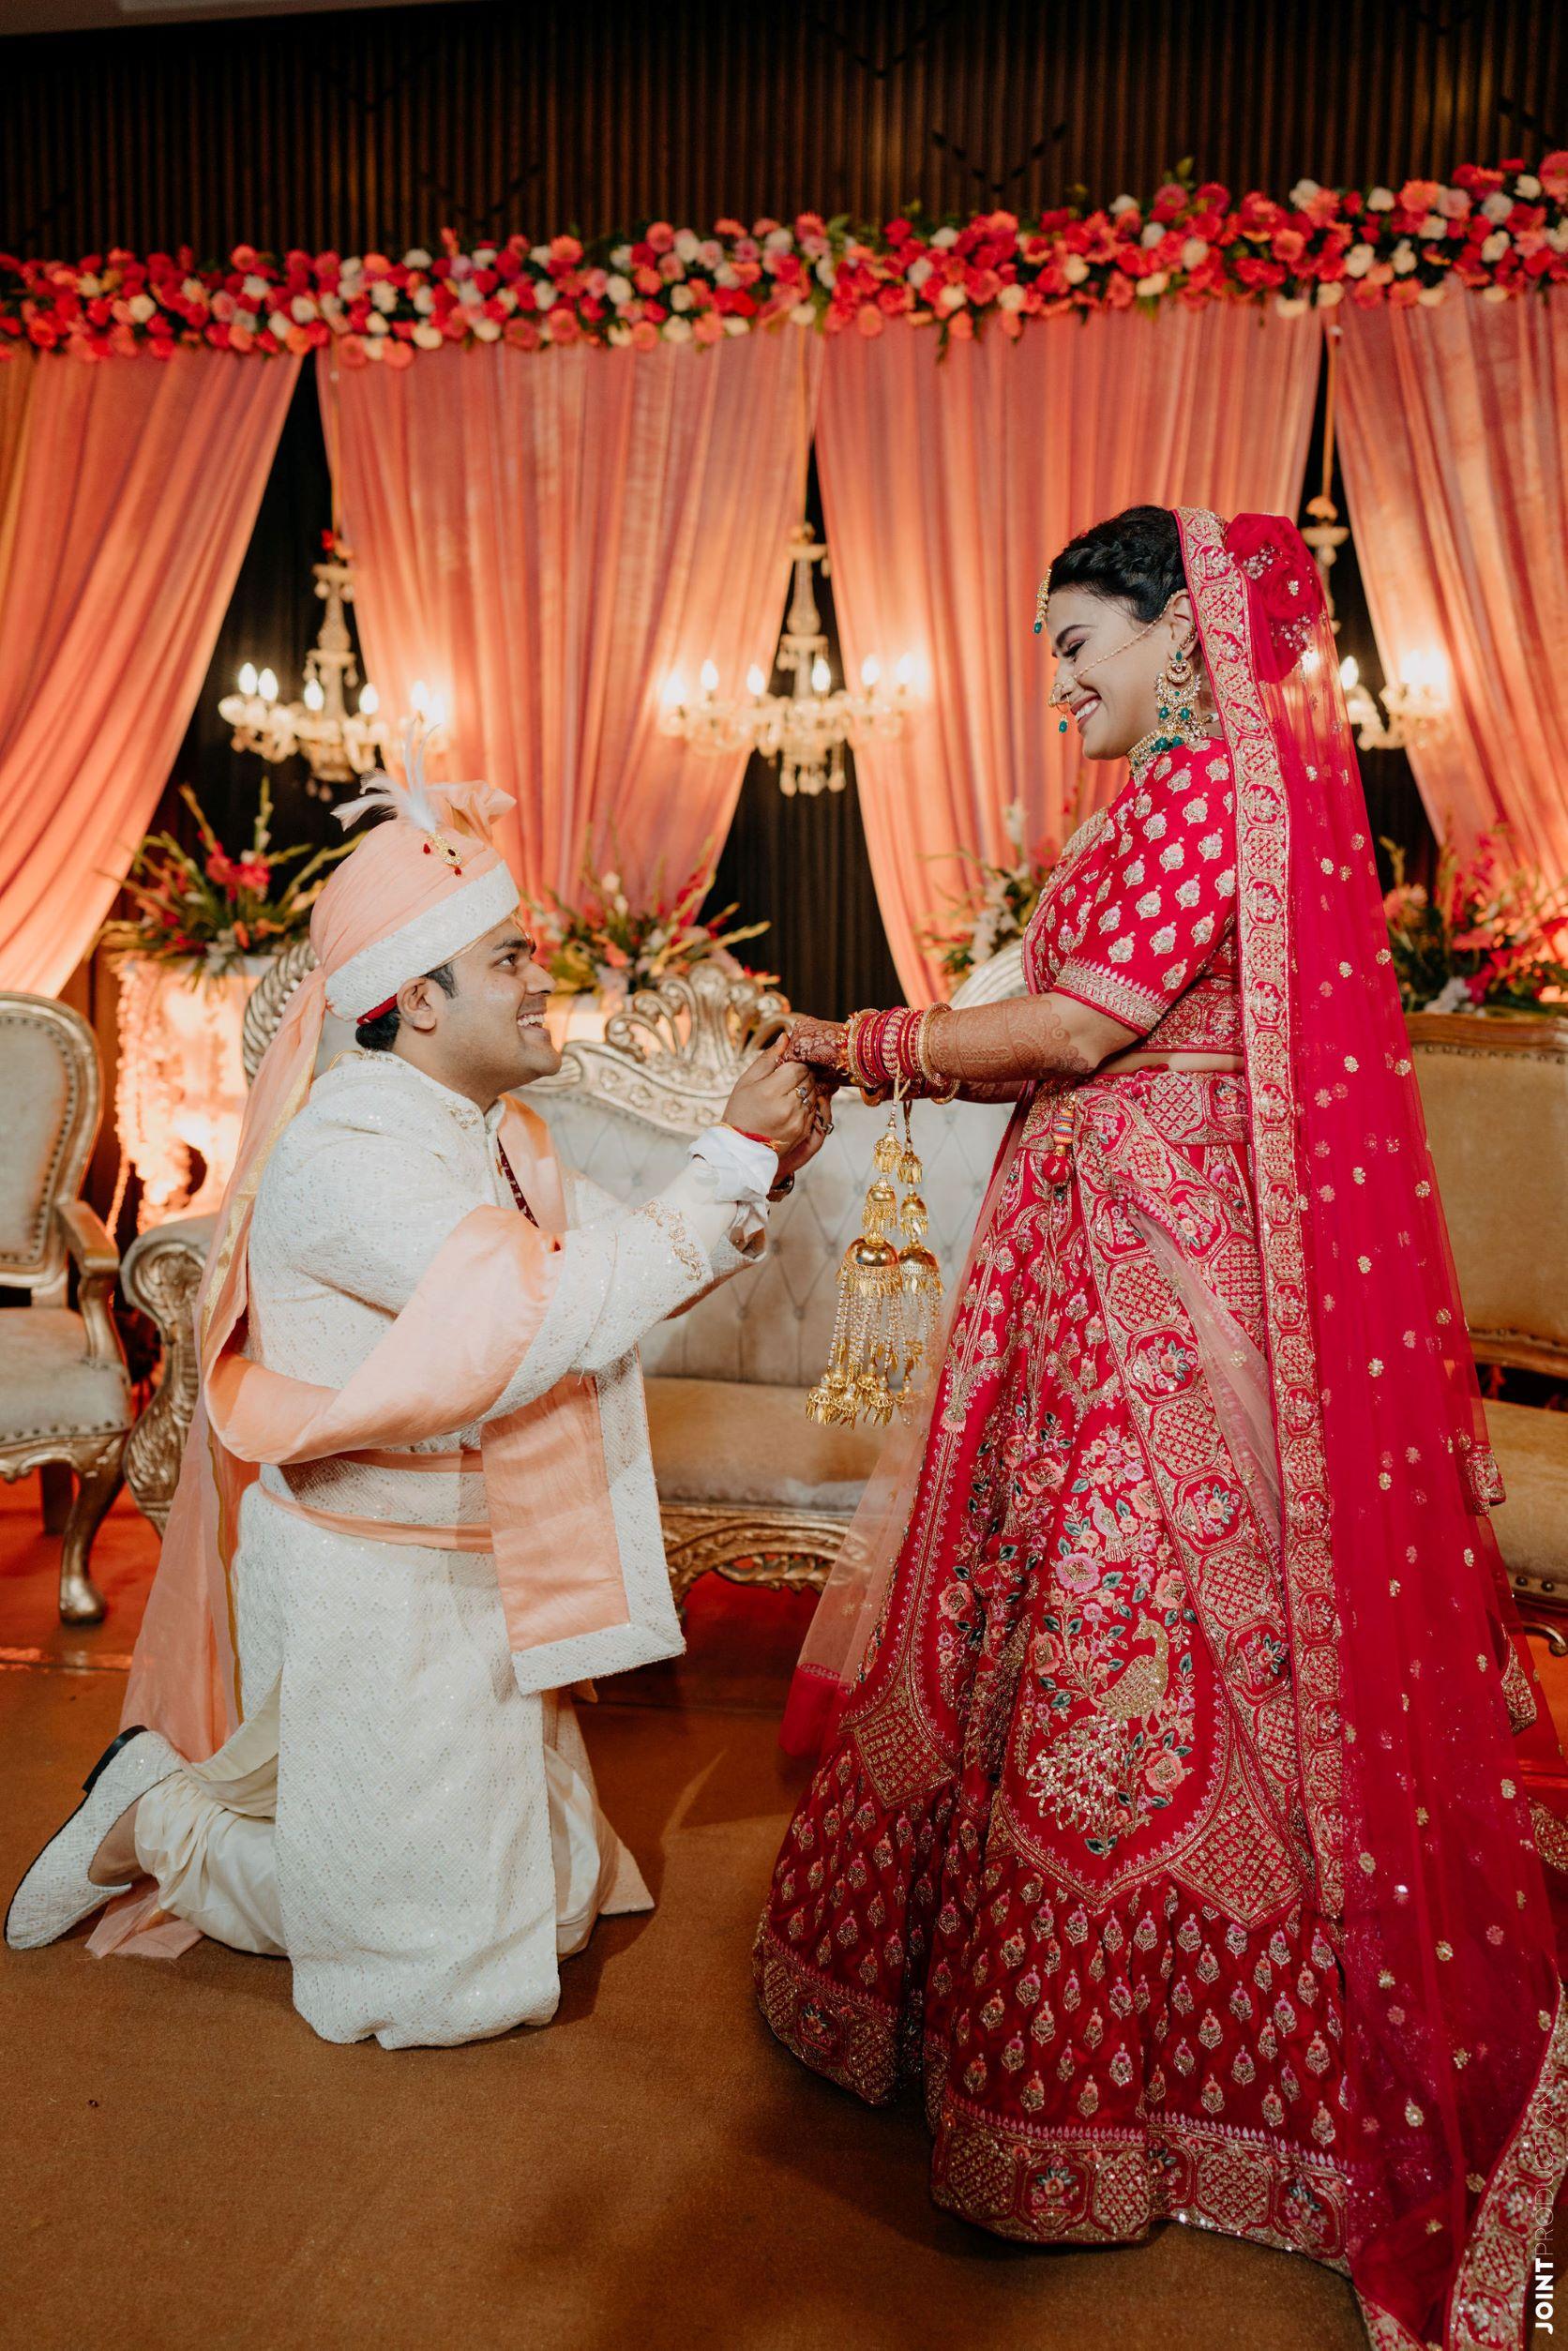 bride in red lehenga groom in white sherwani